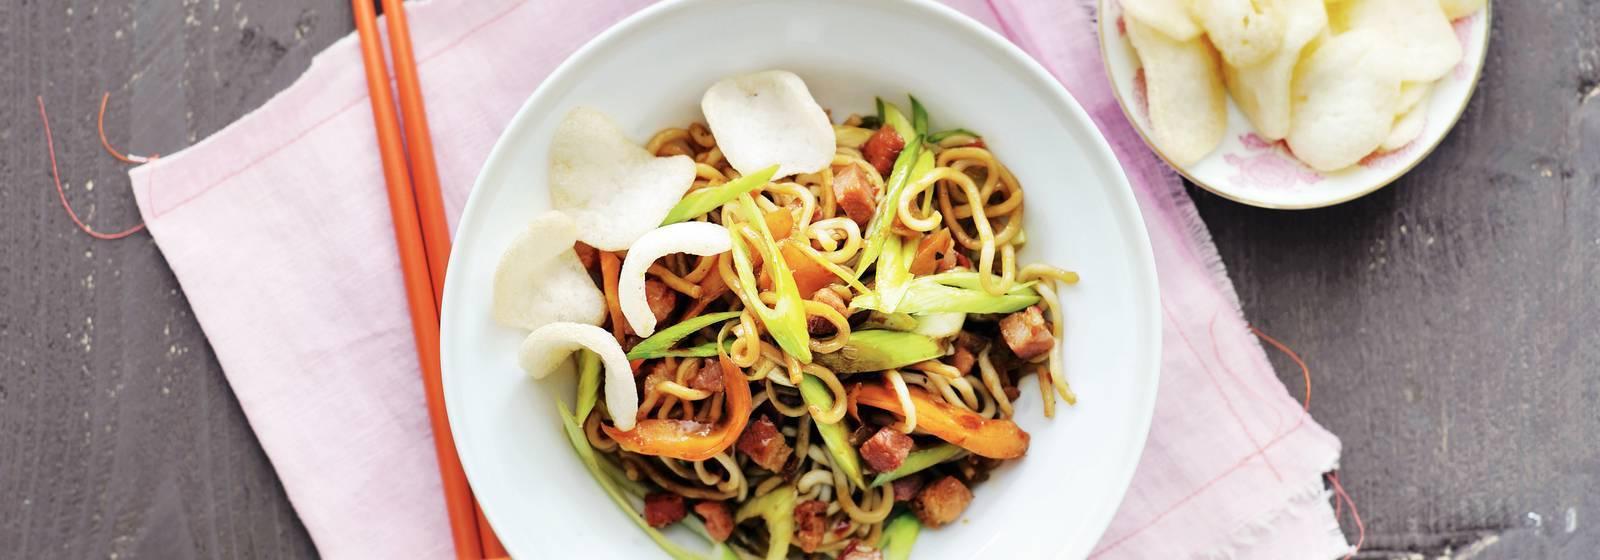 Noodles goreng